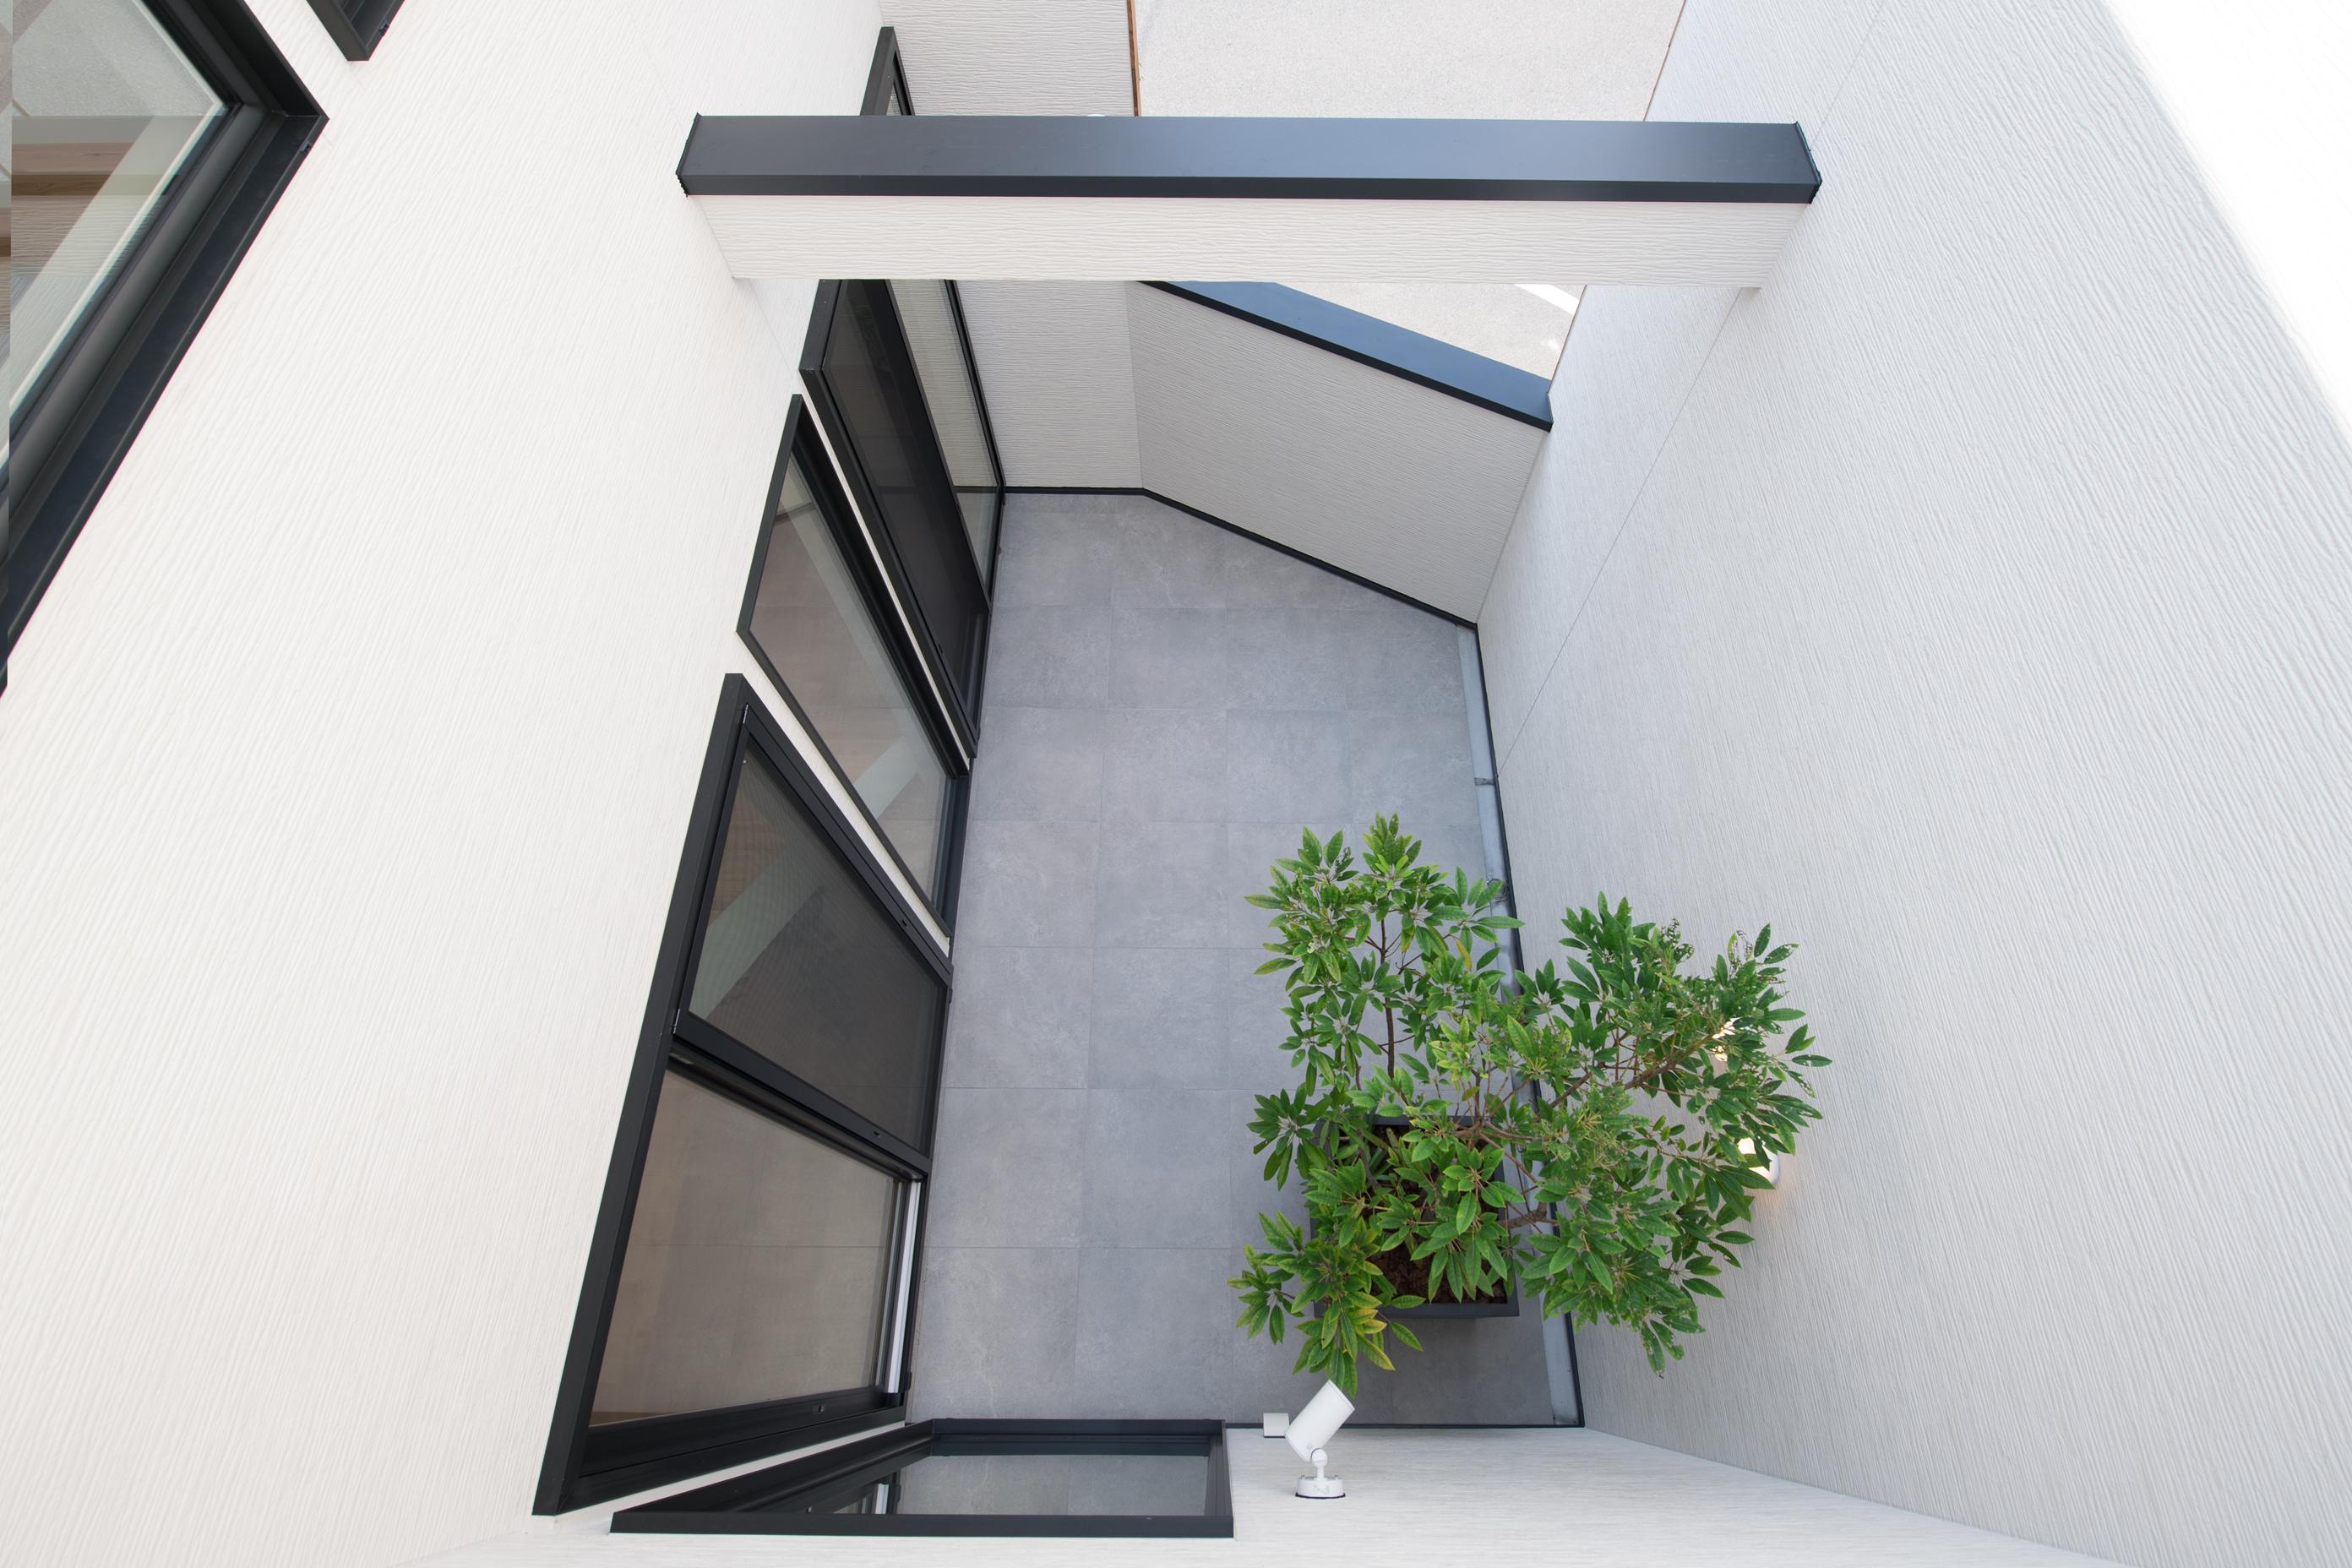 R+house京都宇治城陽モデルハウス